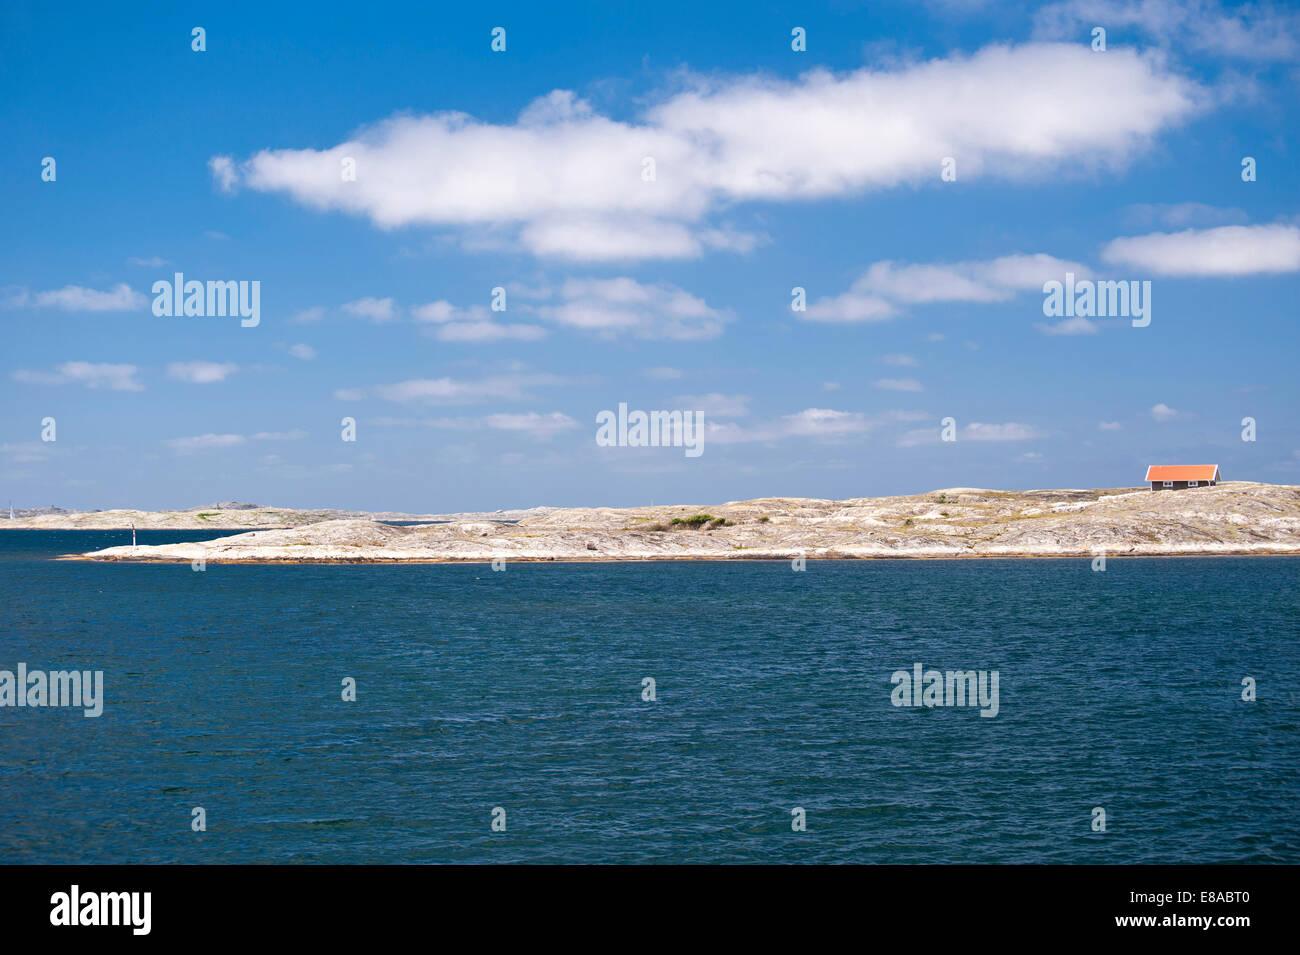 Archipelago, Sweden Stock Photo